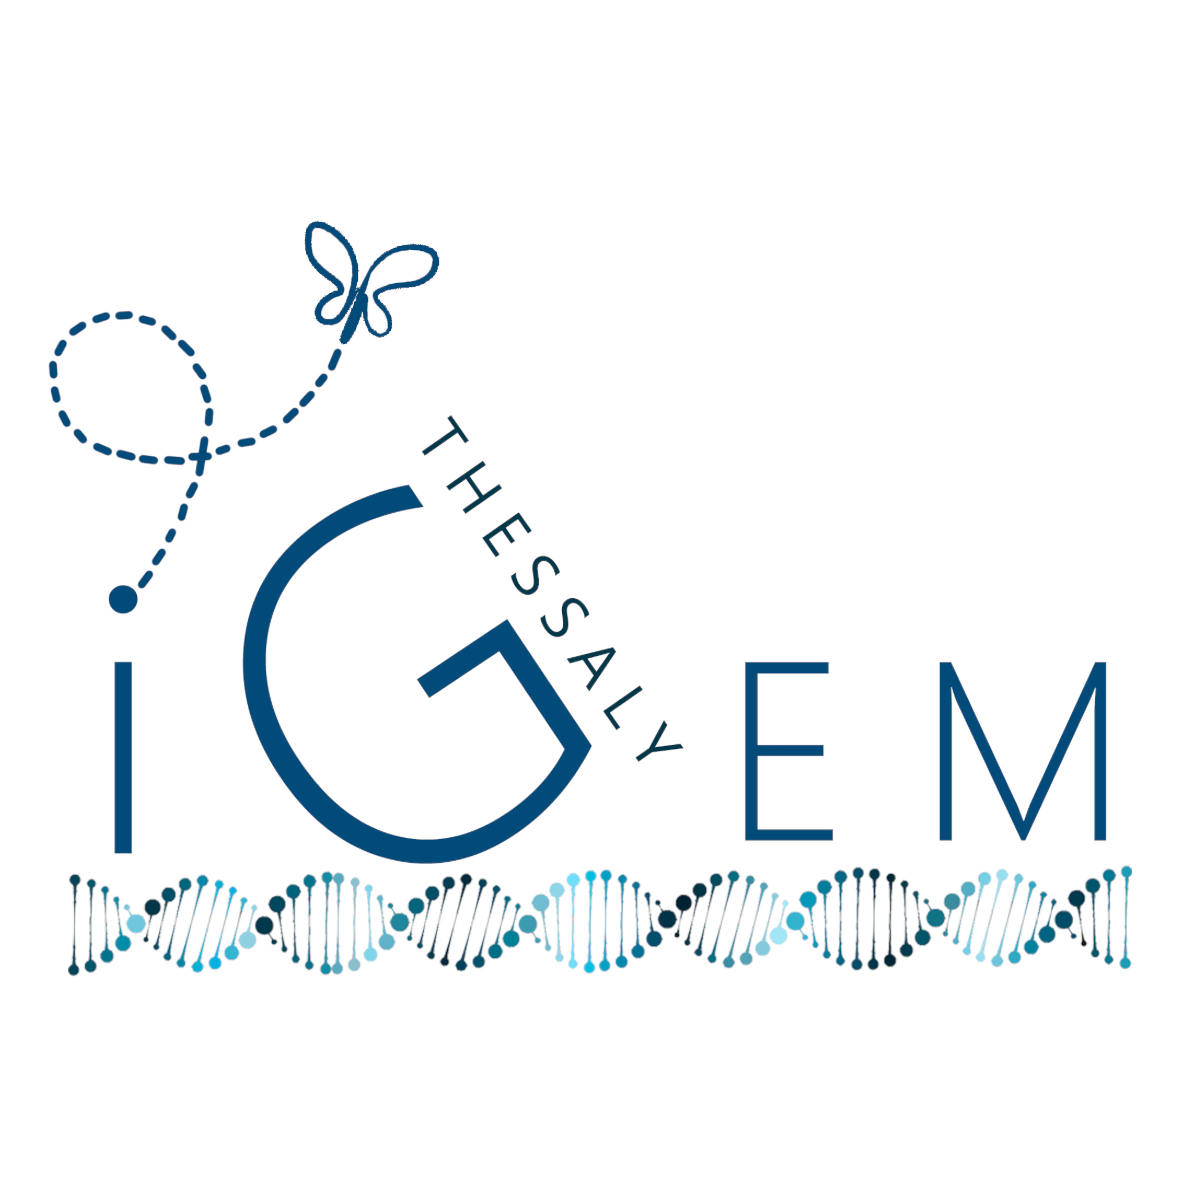 thessaly logo